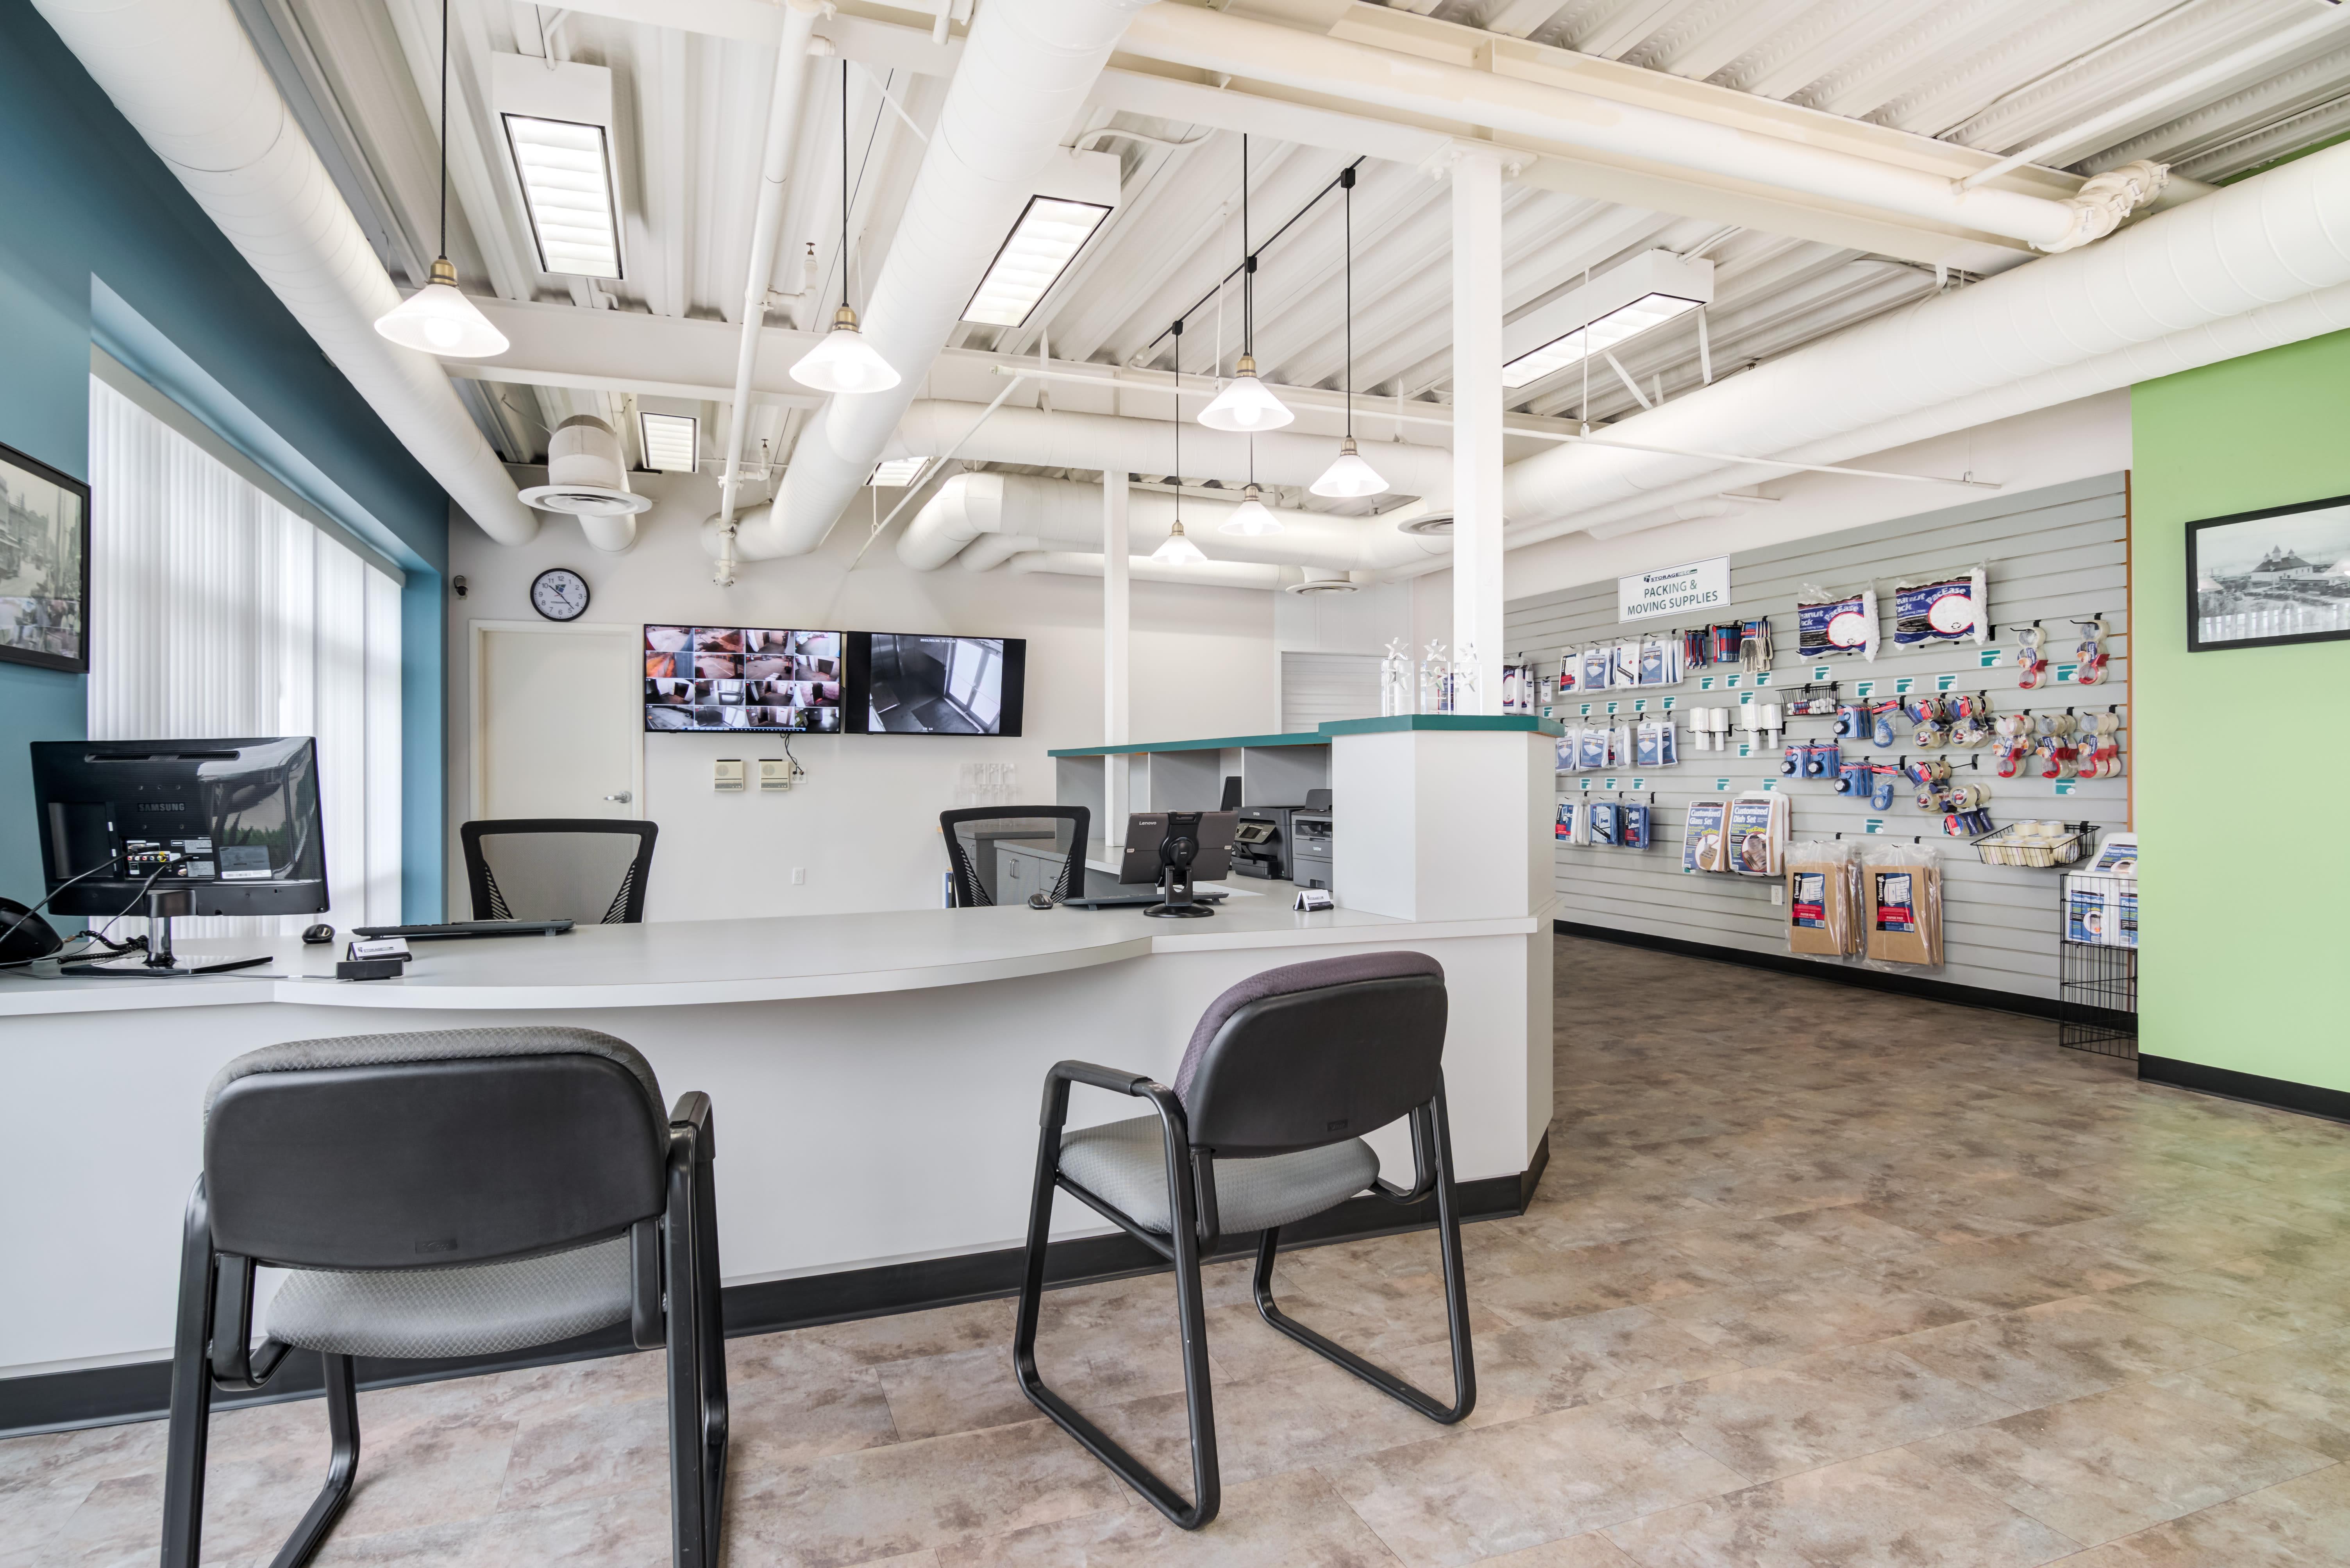 Rental Office at Storage Etc... Hancock St in San Diego,CA